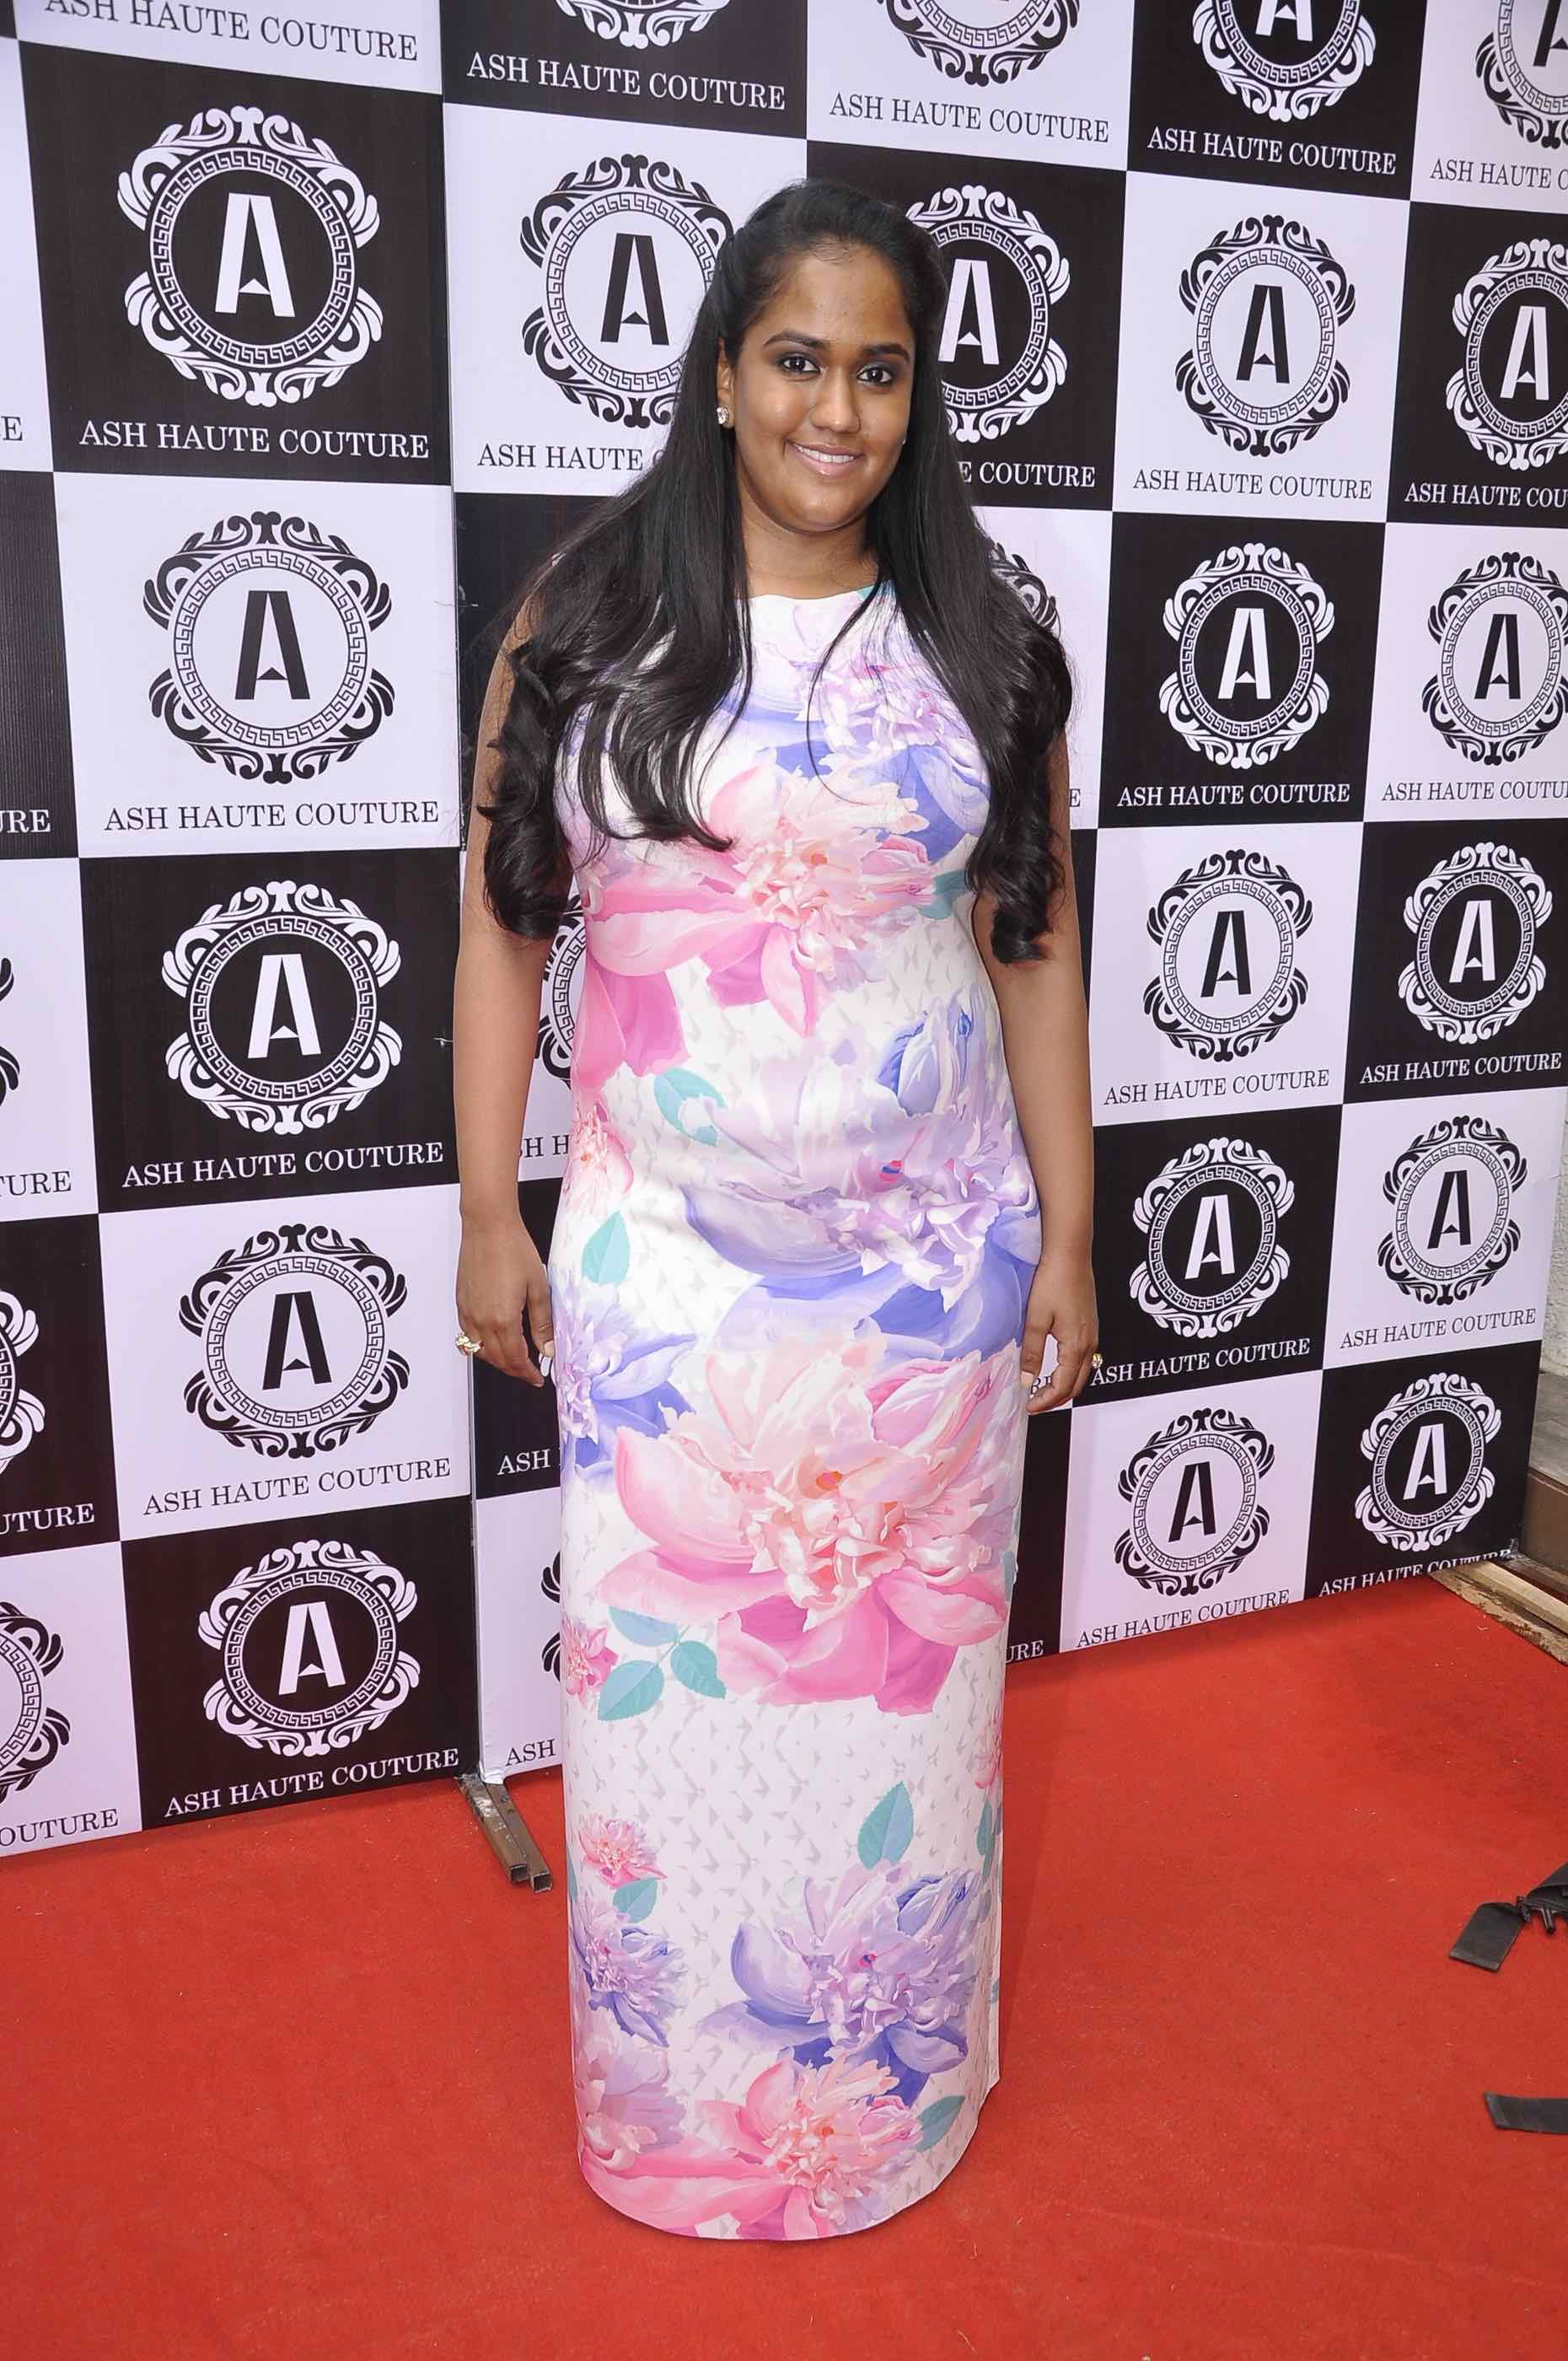 Arpita Khan Sharma in Ash Haute Couture